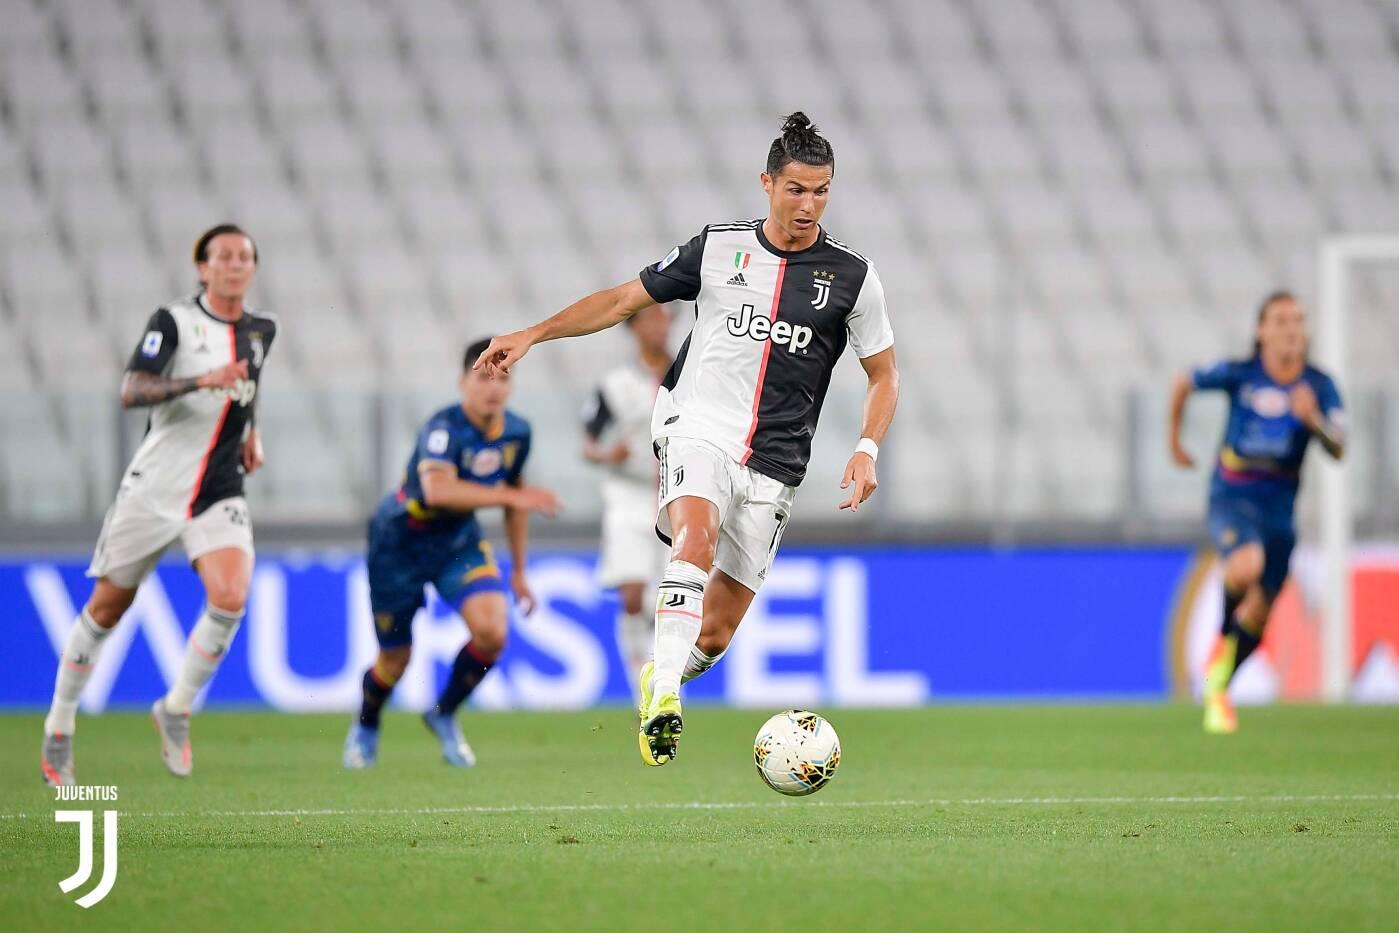 Foto: Reprodução/Twitter Juventus